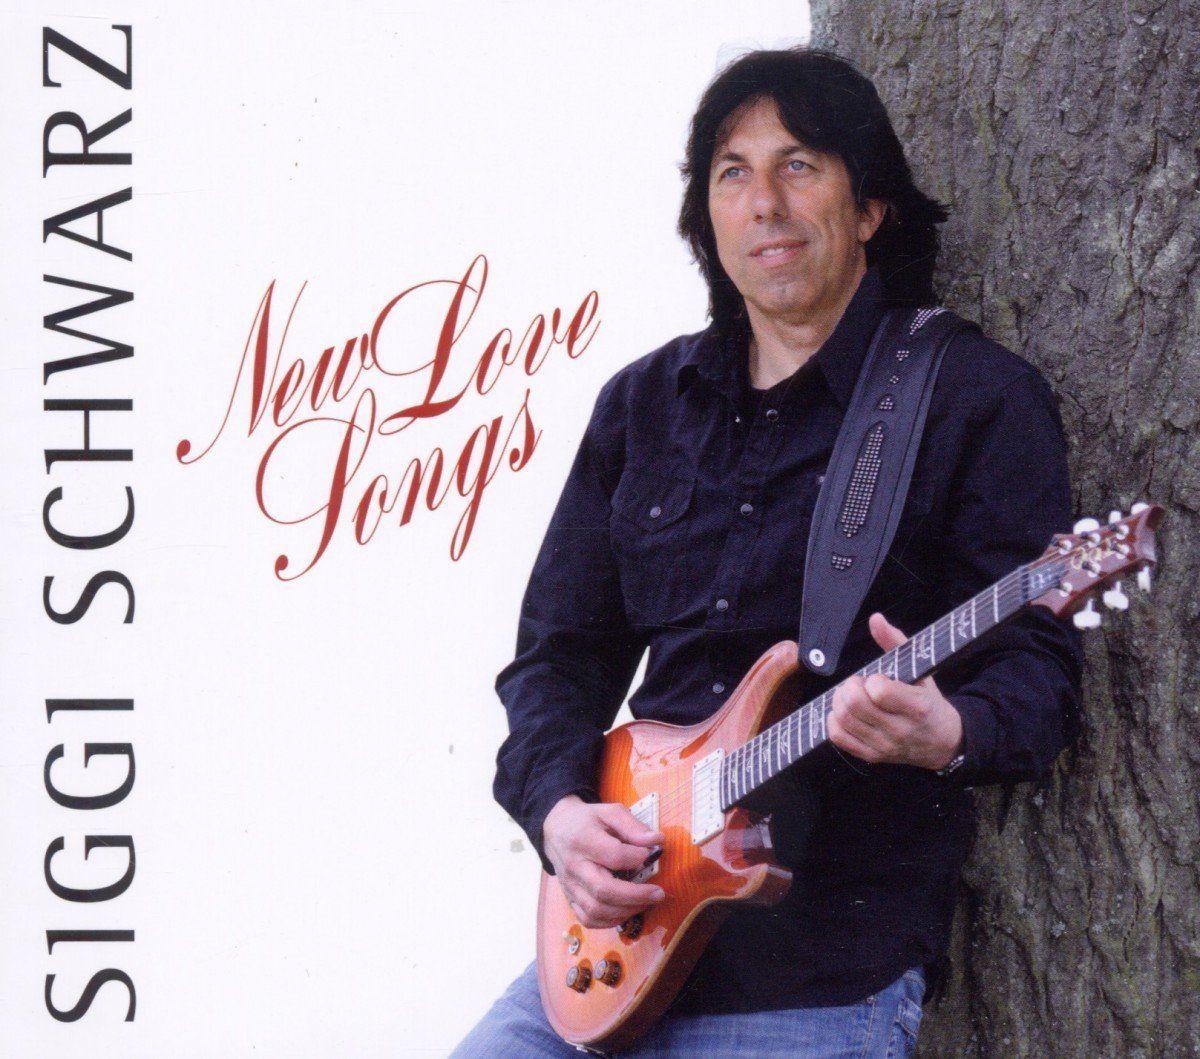 Siggi Schwarz Siggi Schwarz. New Love Songs